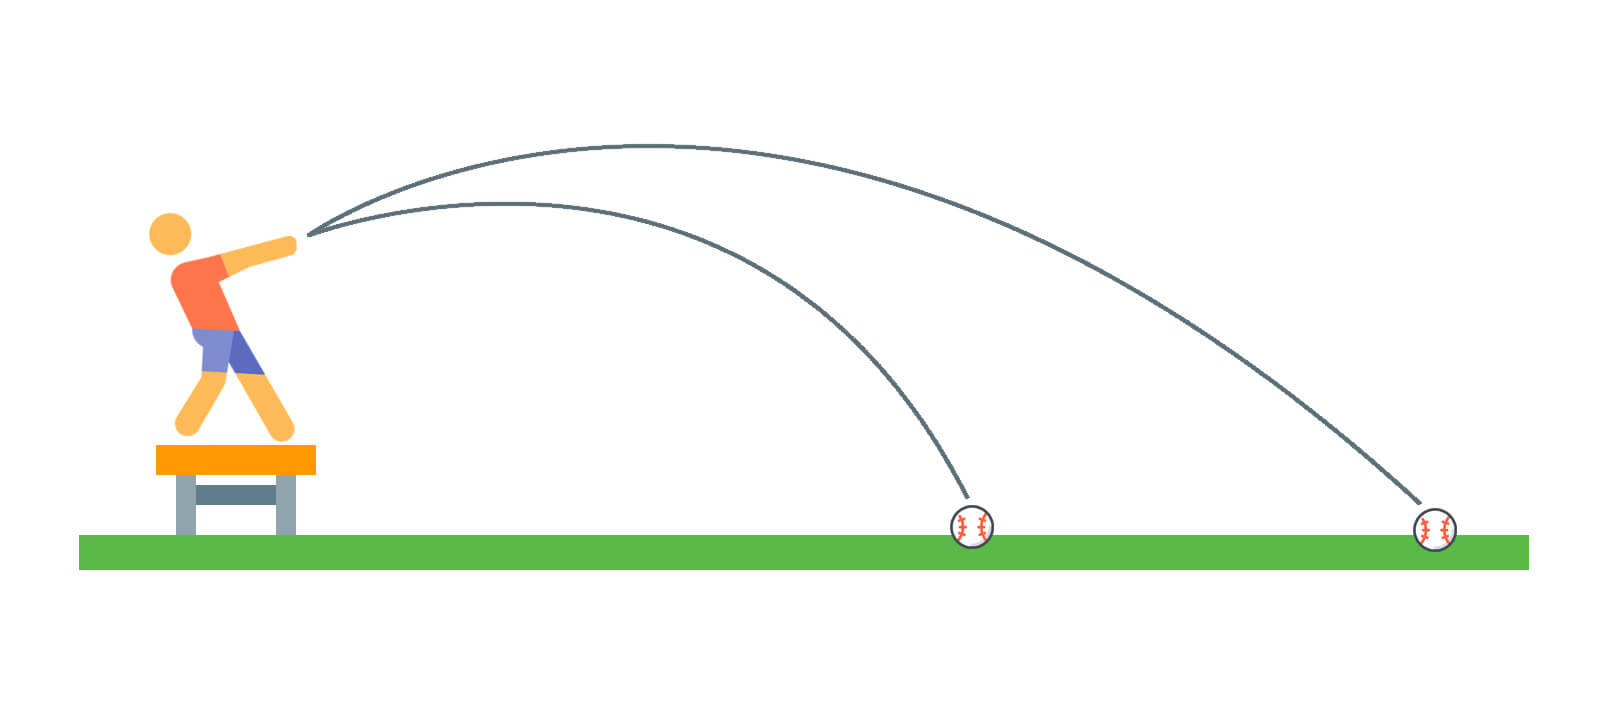 Ball Throw Example 2